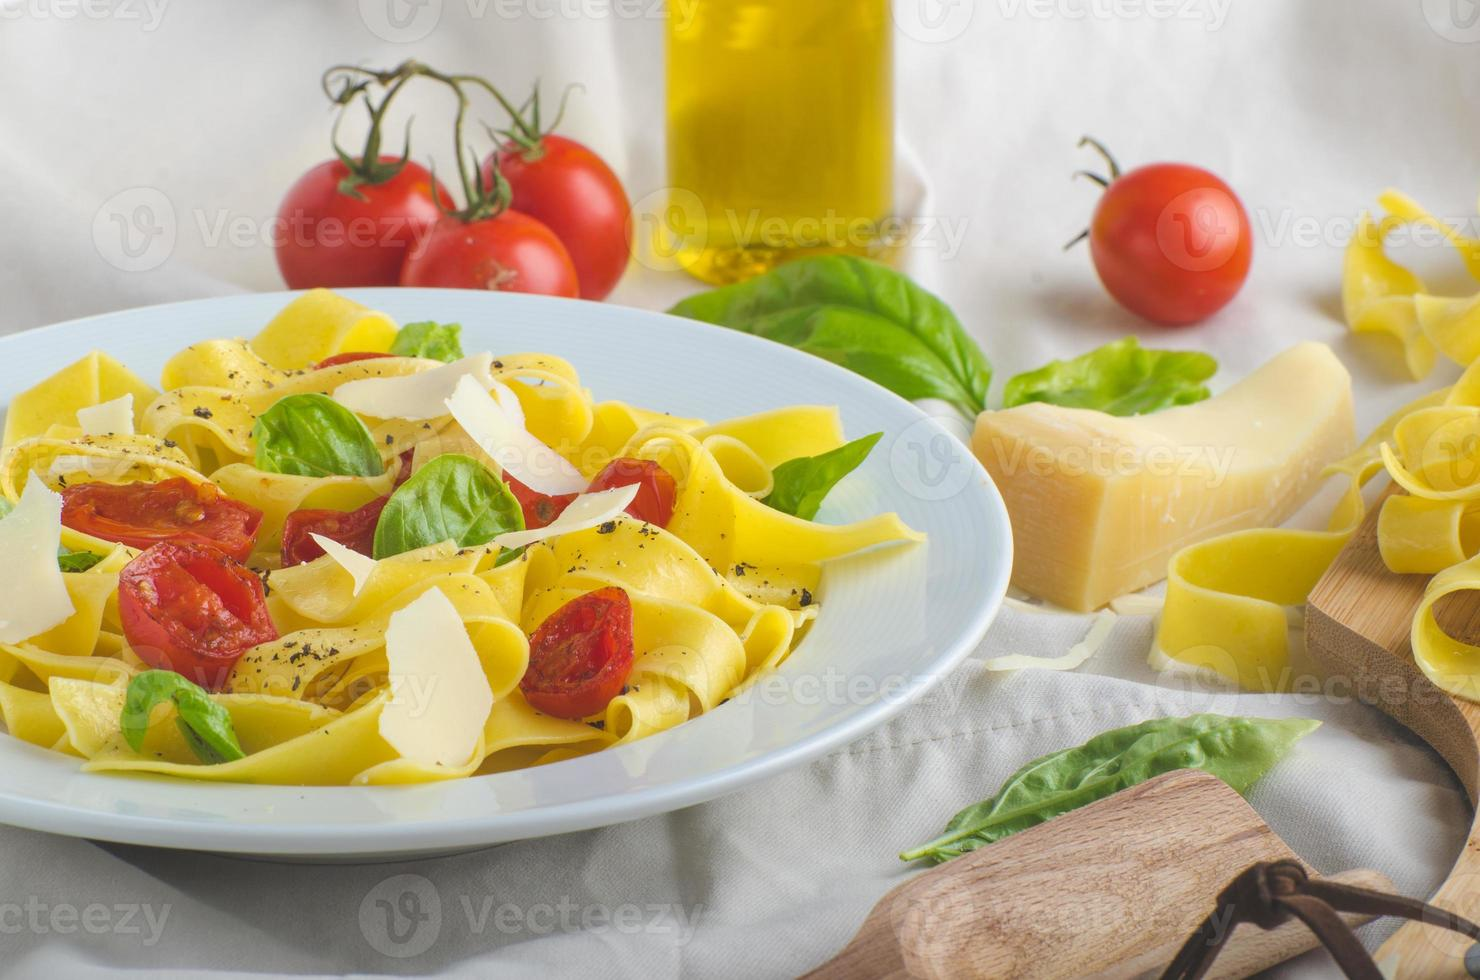 Tagliatelle in Italian colors, roasted tomatoes, basil Tagliatelle photo